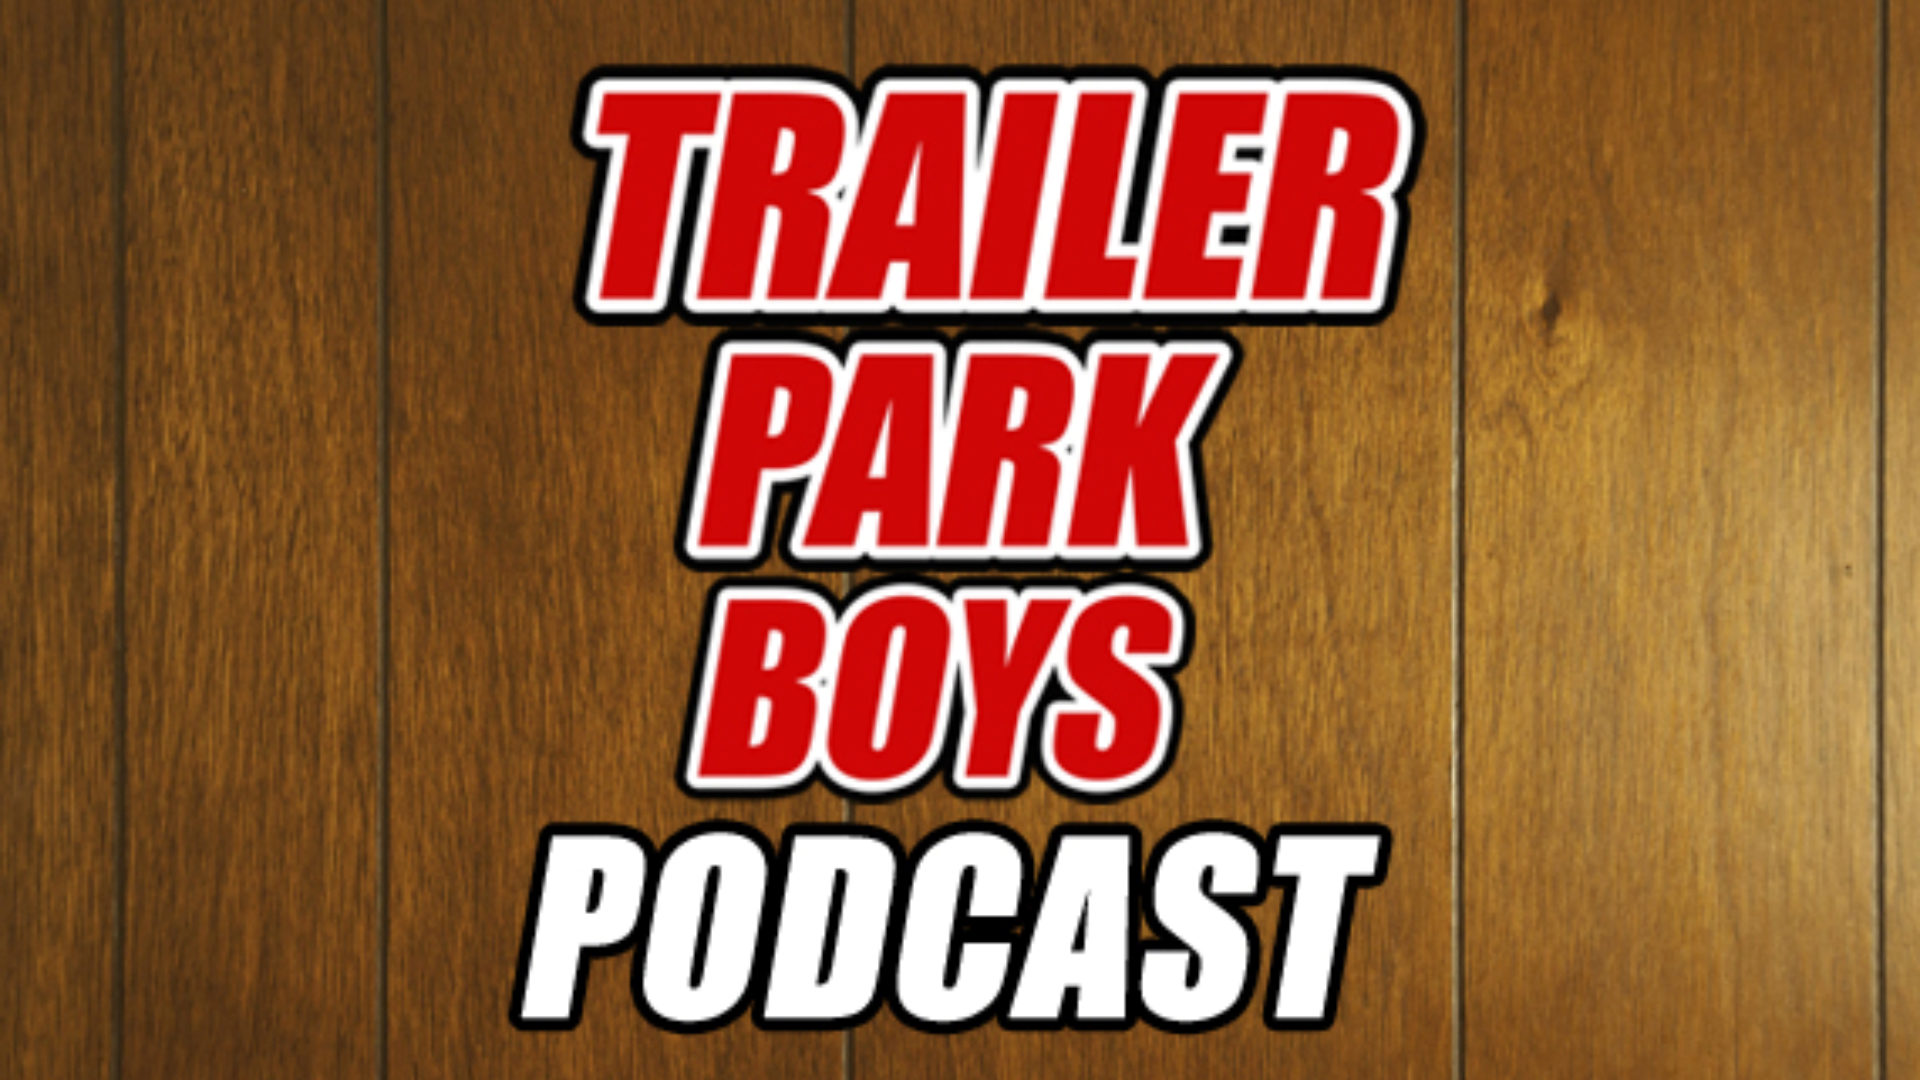 After Porn Ends 2017 Trailer trailer park boys | trailer park boys podcasts | swearnet